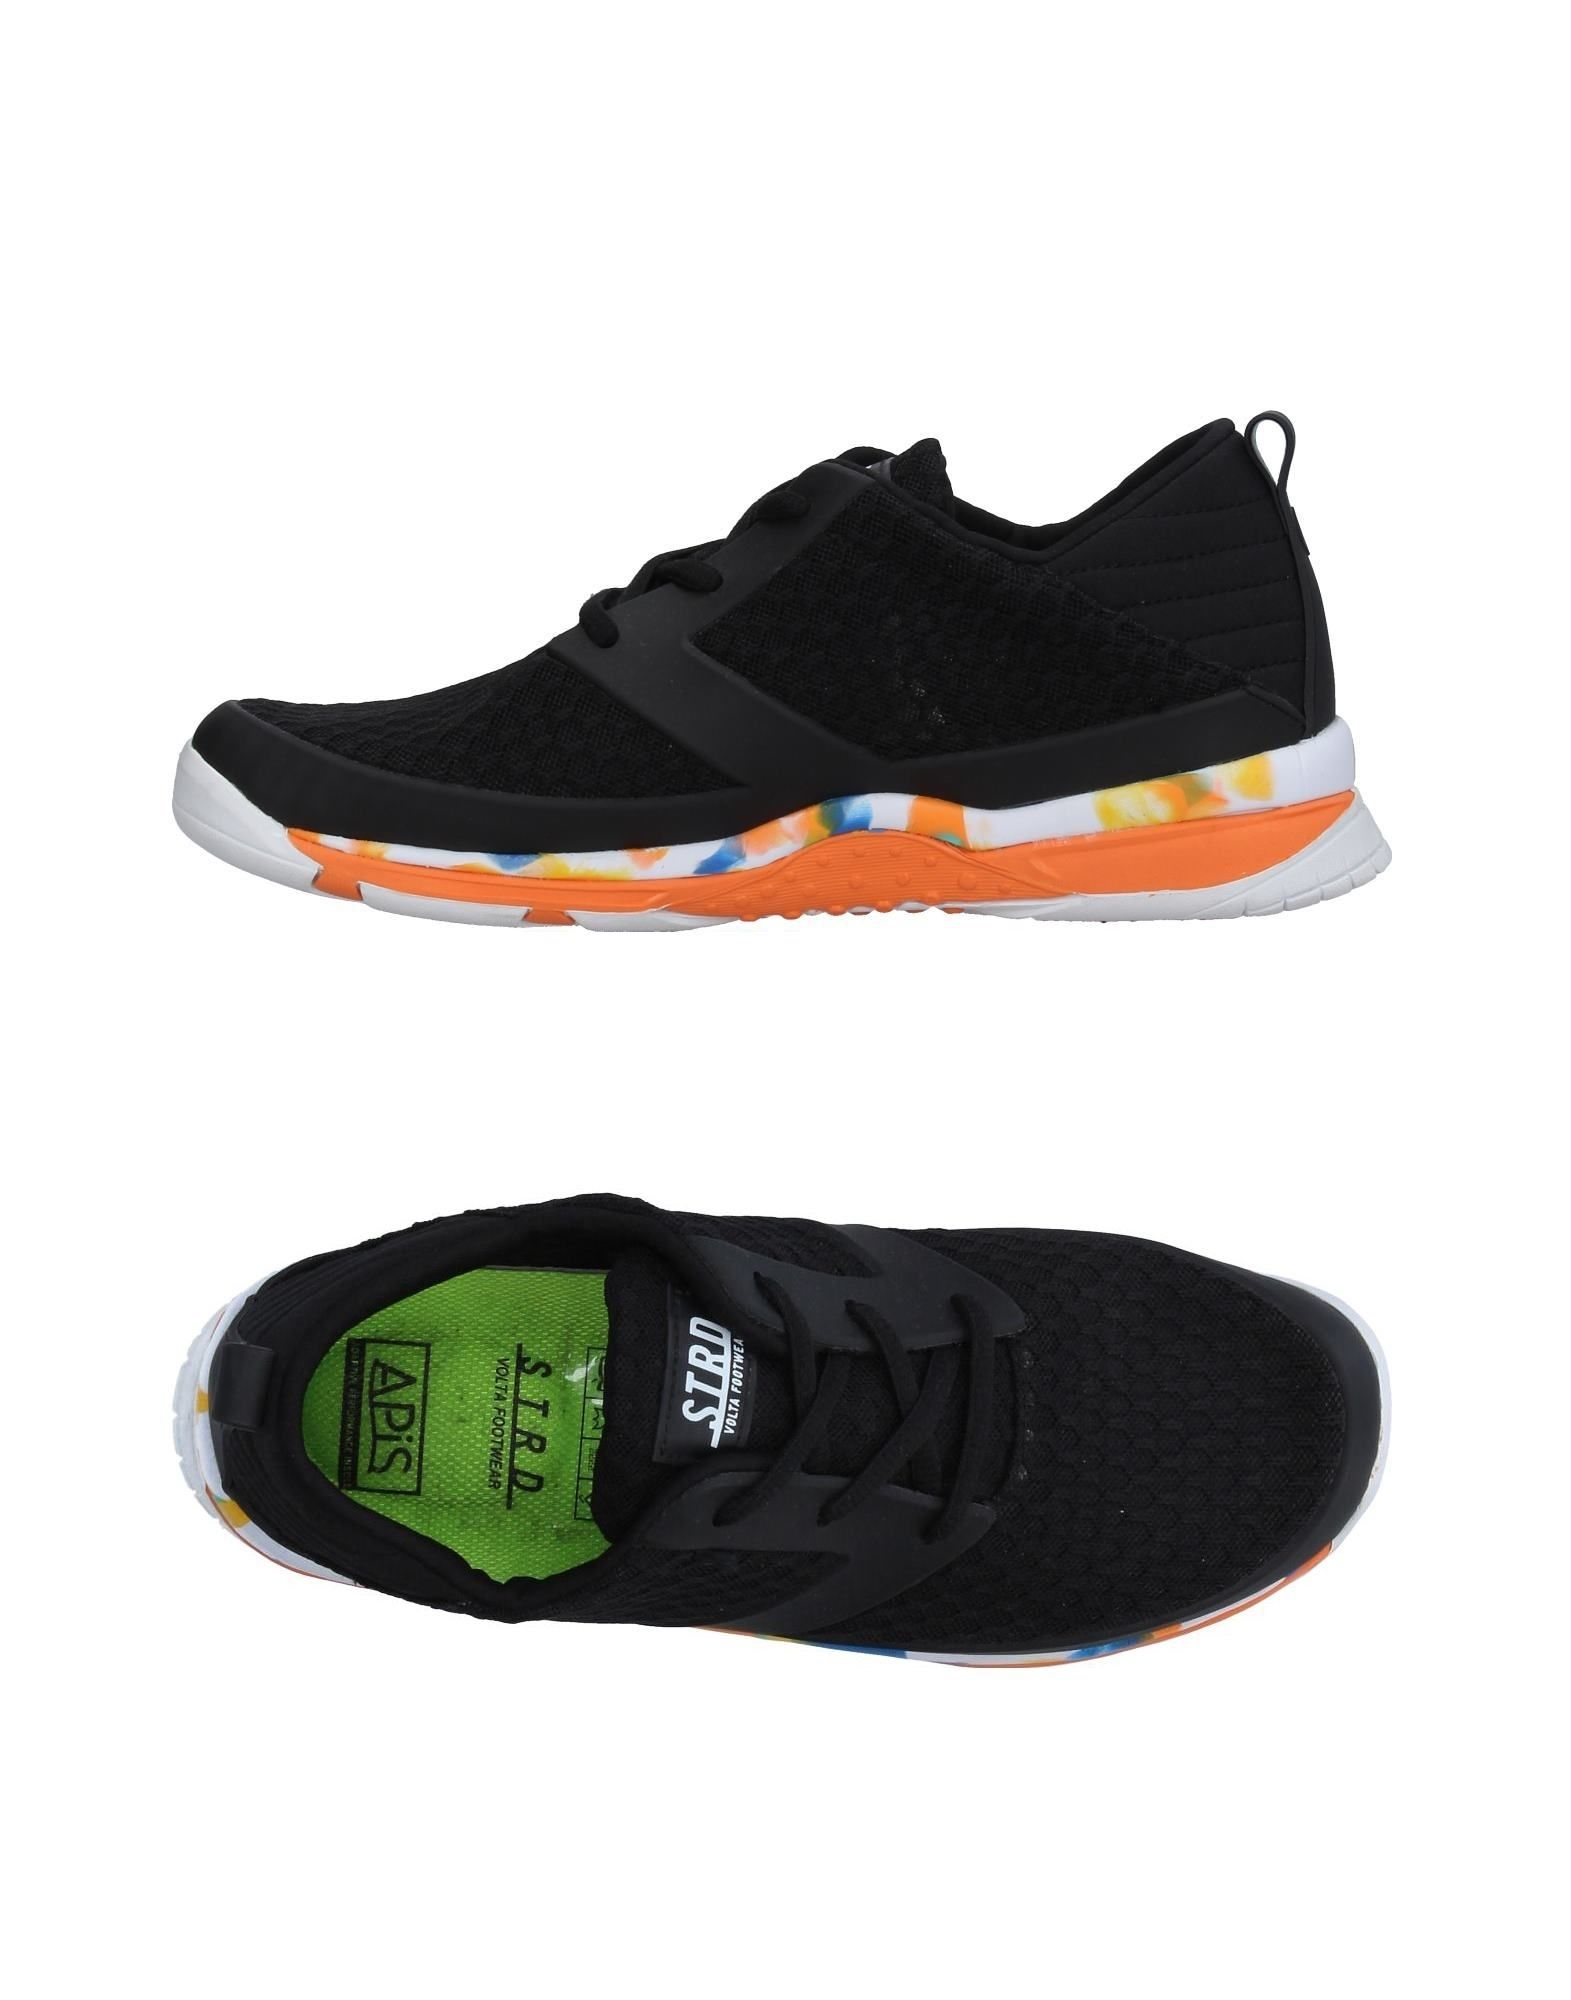 Strd By Volta Footwear Sneakers Herren  11260095PJ Heiße Schuhe